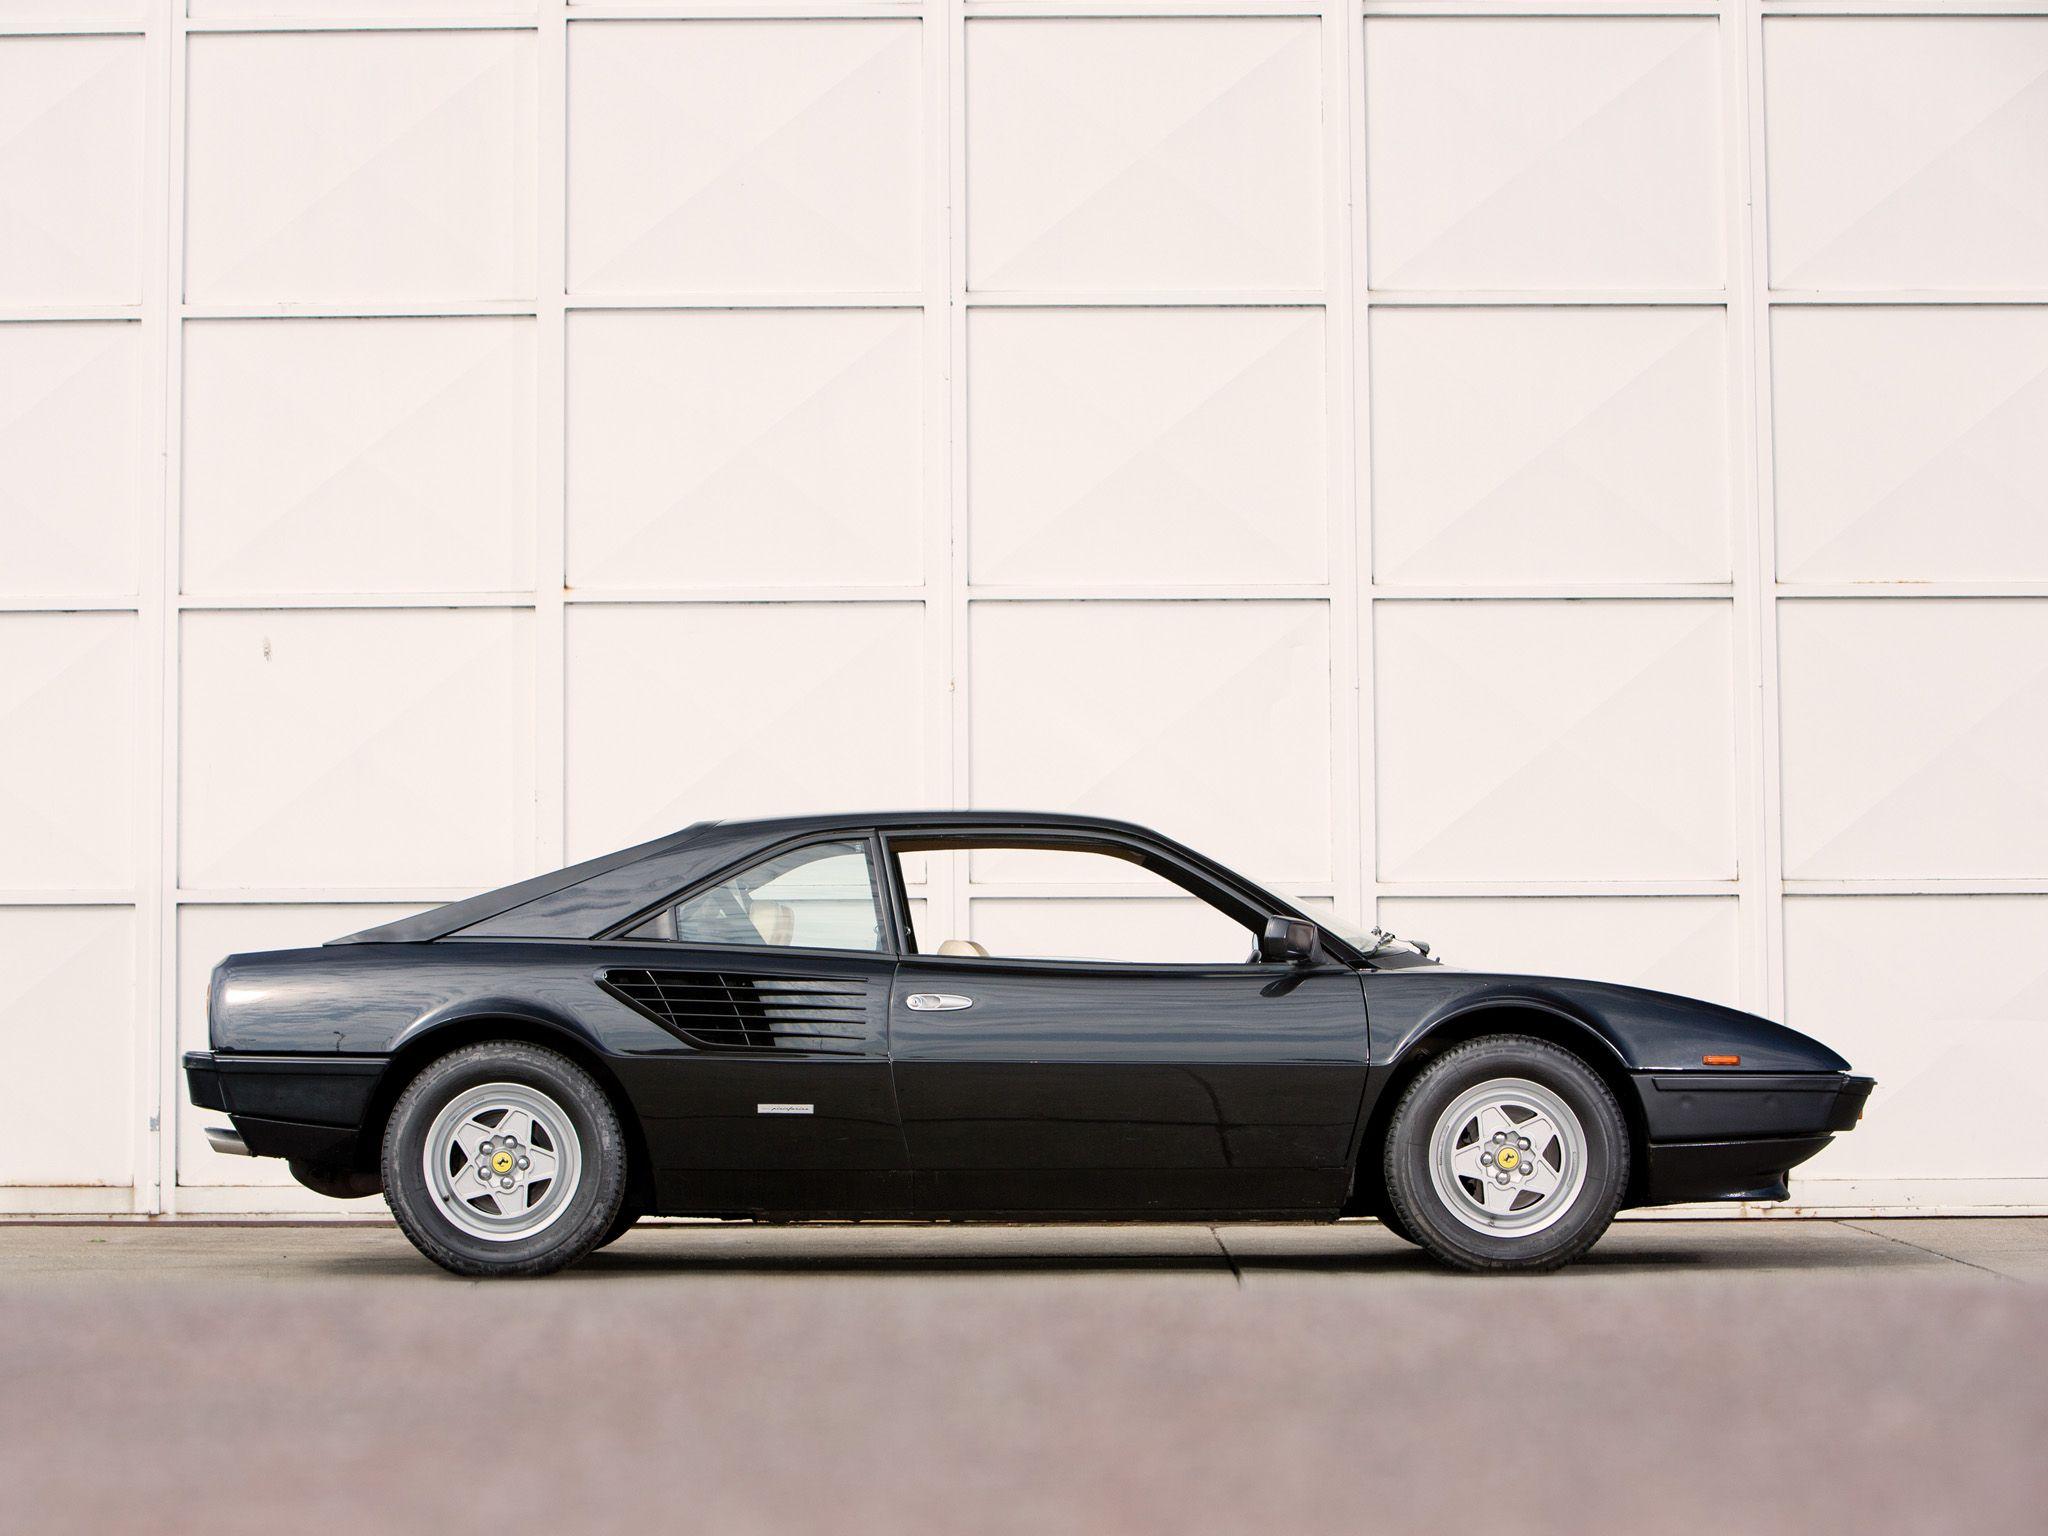 0a716357f47852083fc45cb7c9db535c Gorgeous Ferrari Mondial 3.2 Cabriolet V8 Quattrovalvole Cars Trend